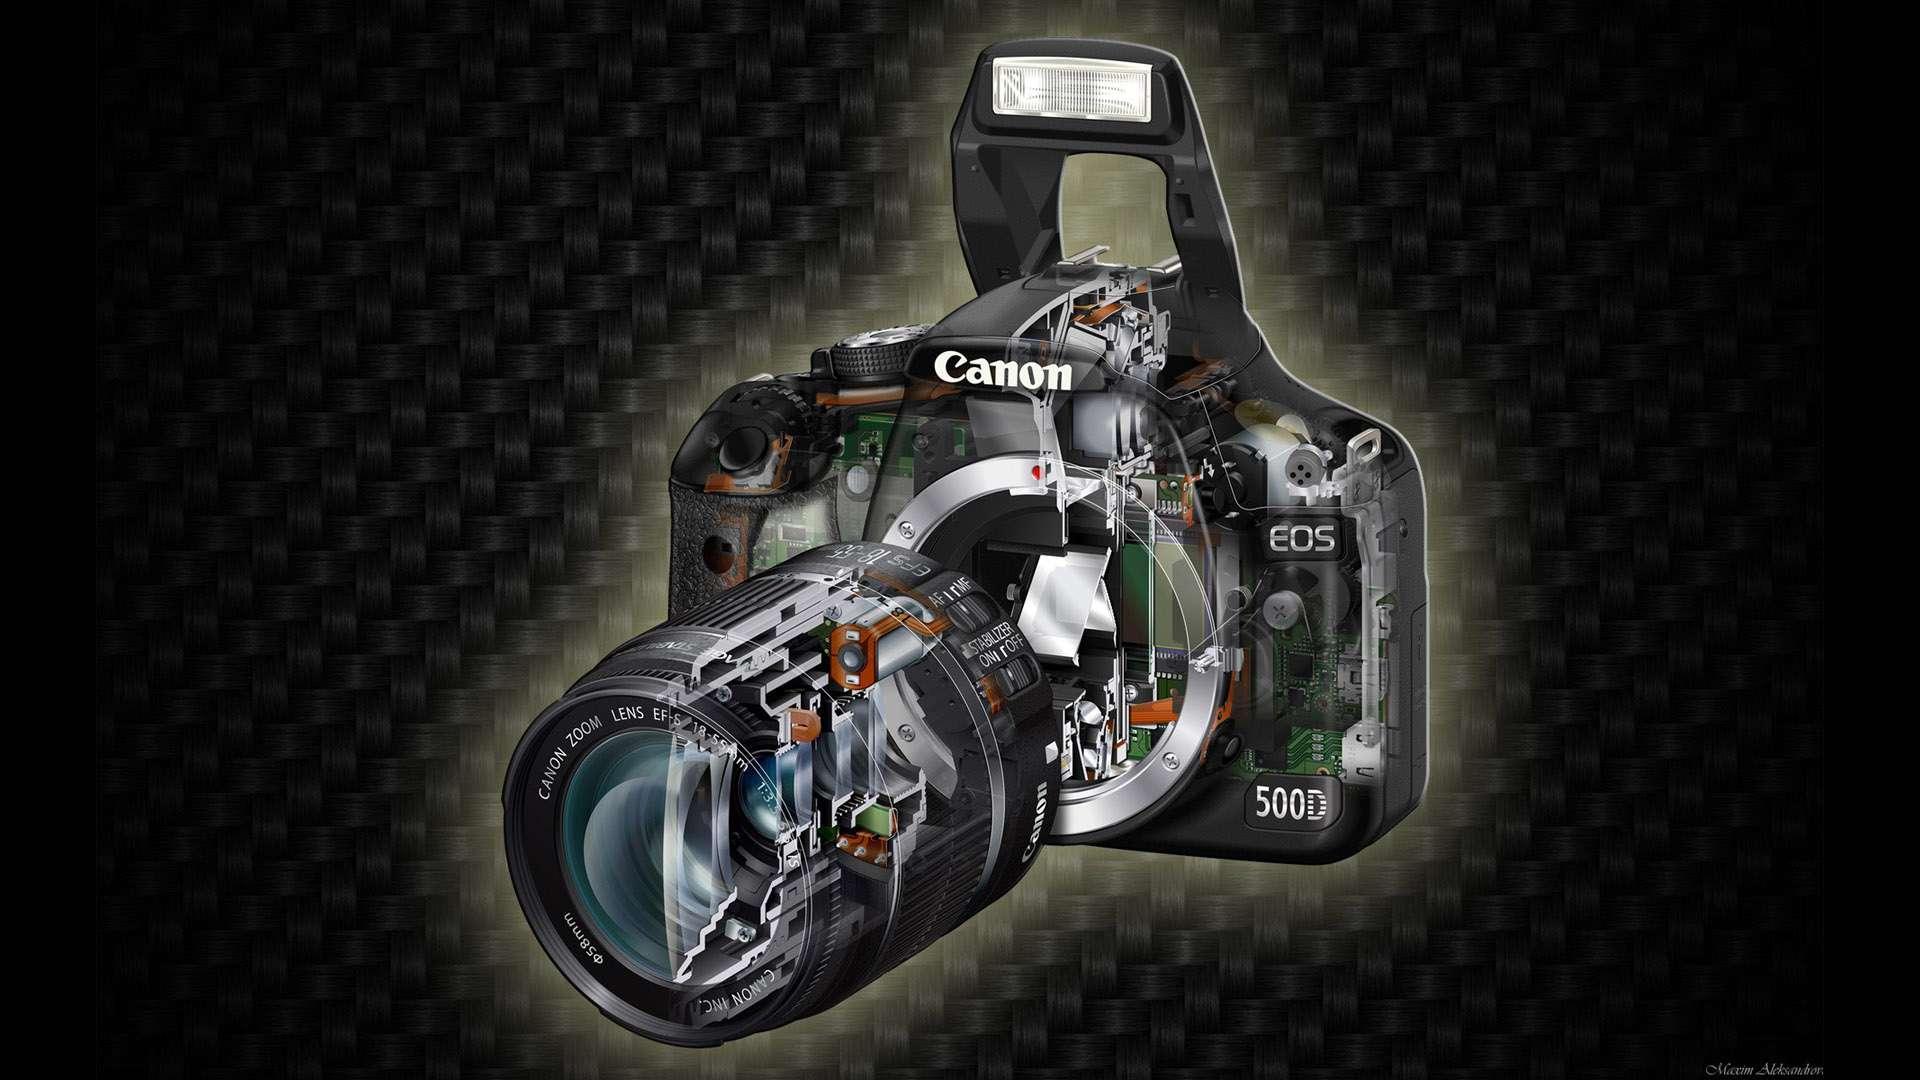 canon inside hipster wallpaper gadgets fullhdwpp 1920x1080